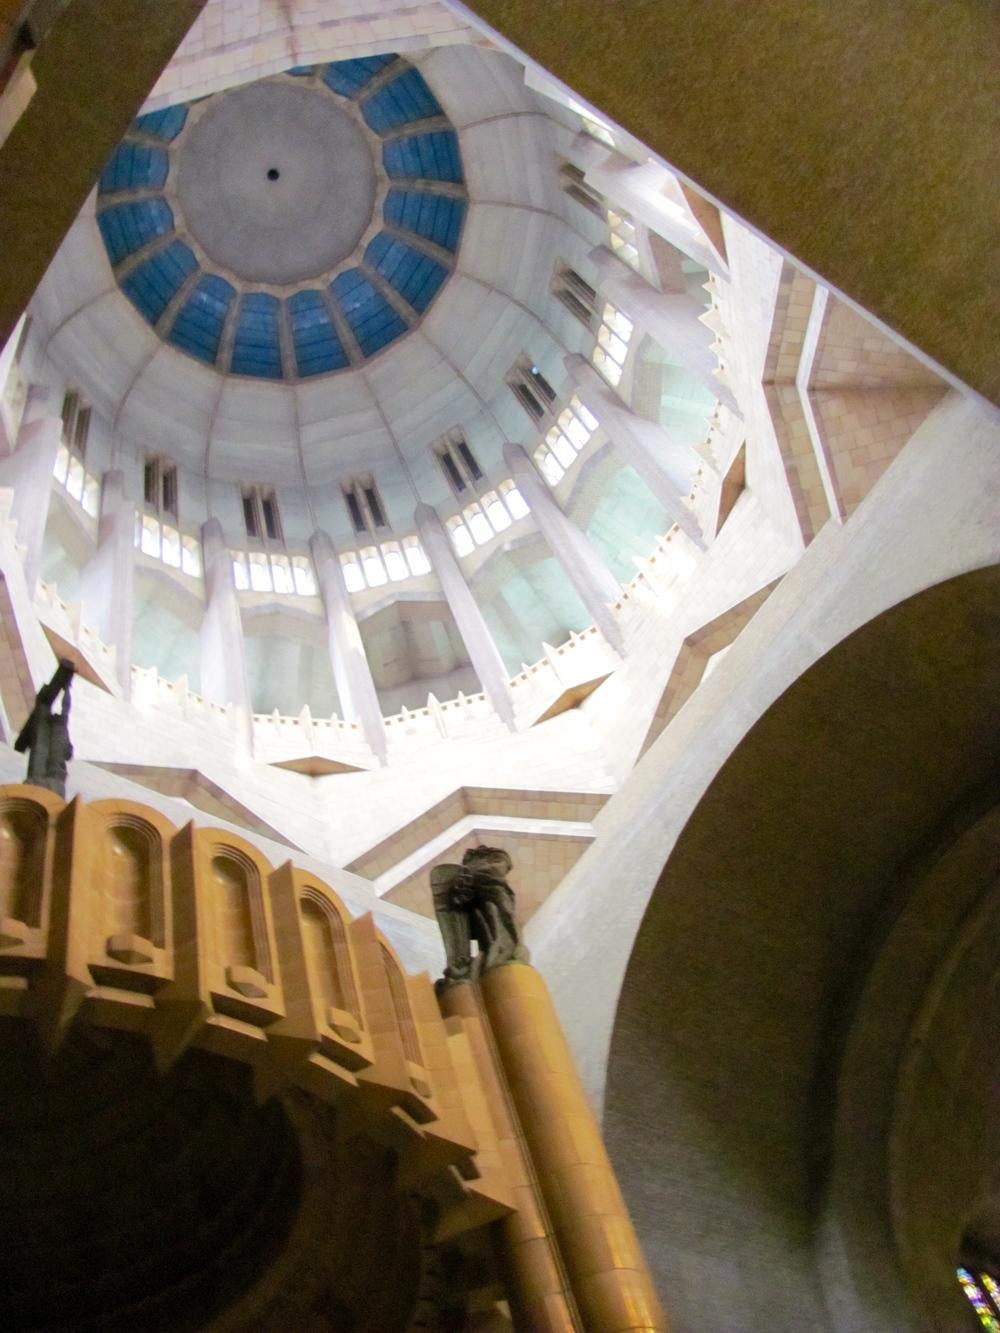 Main dome of the Basilique Nationale du Sacre-Coeur, Brussels, Belgium, VHS 2010